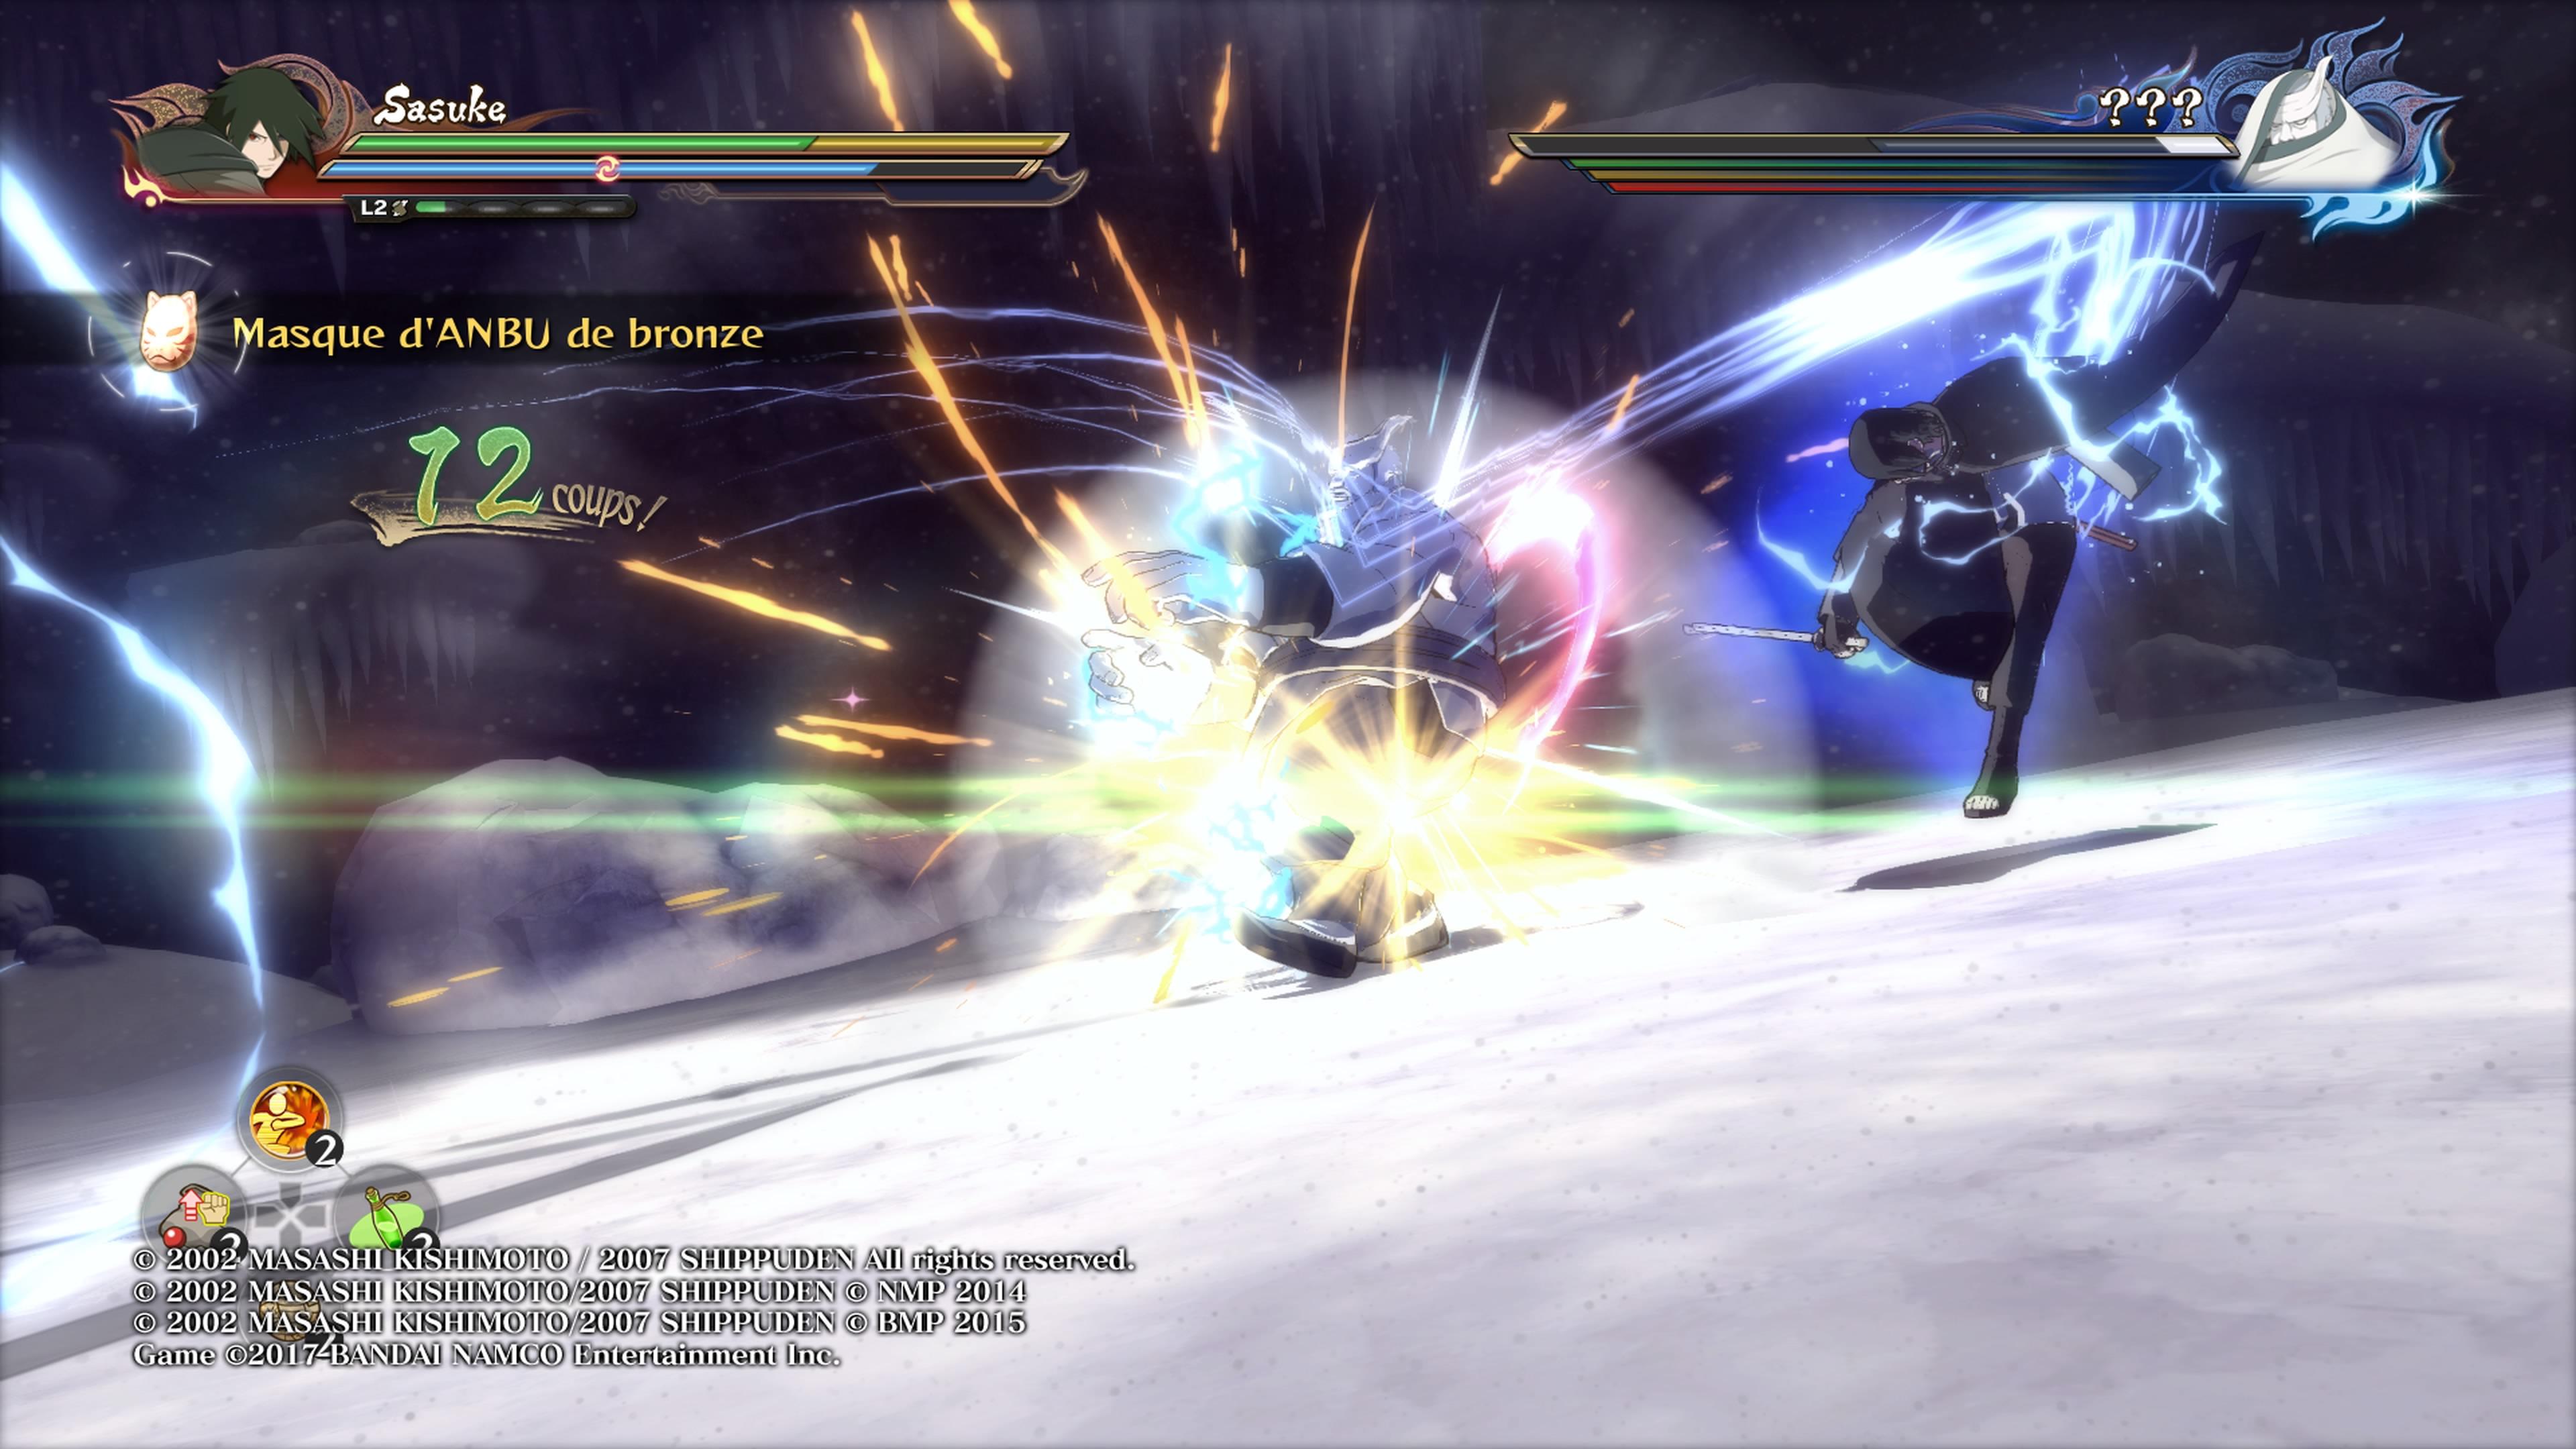 NARUTO SHIPPUDEN: Ultimate Ninja STORM 4 ROAD TO BORUTO_20170926142716